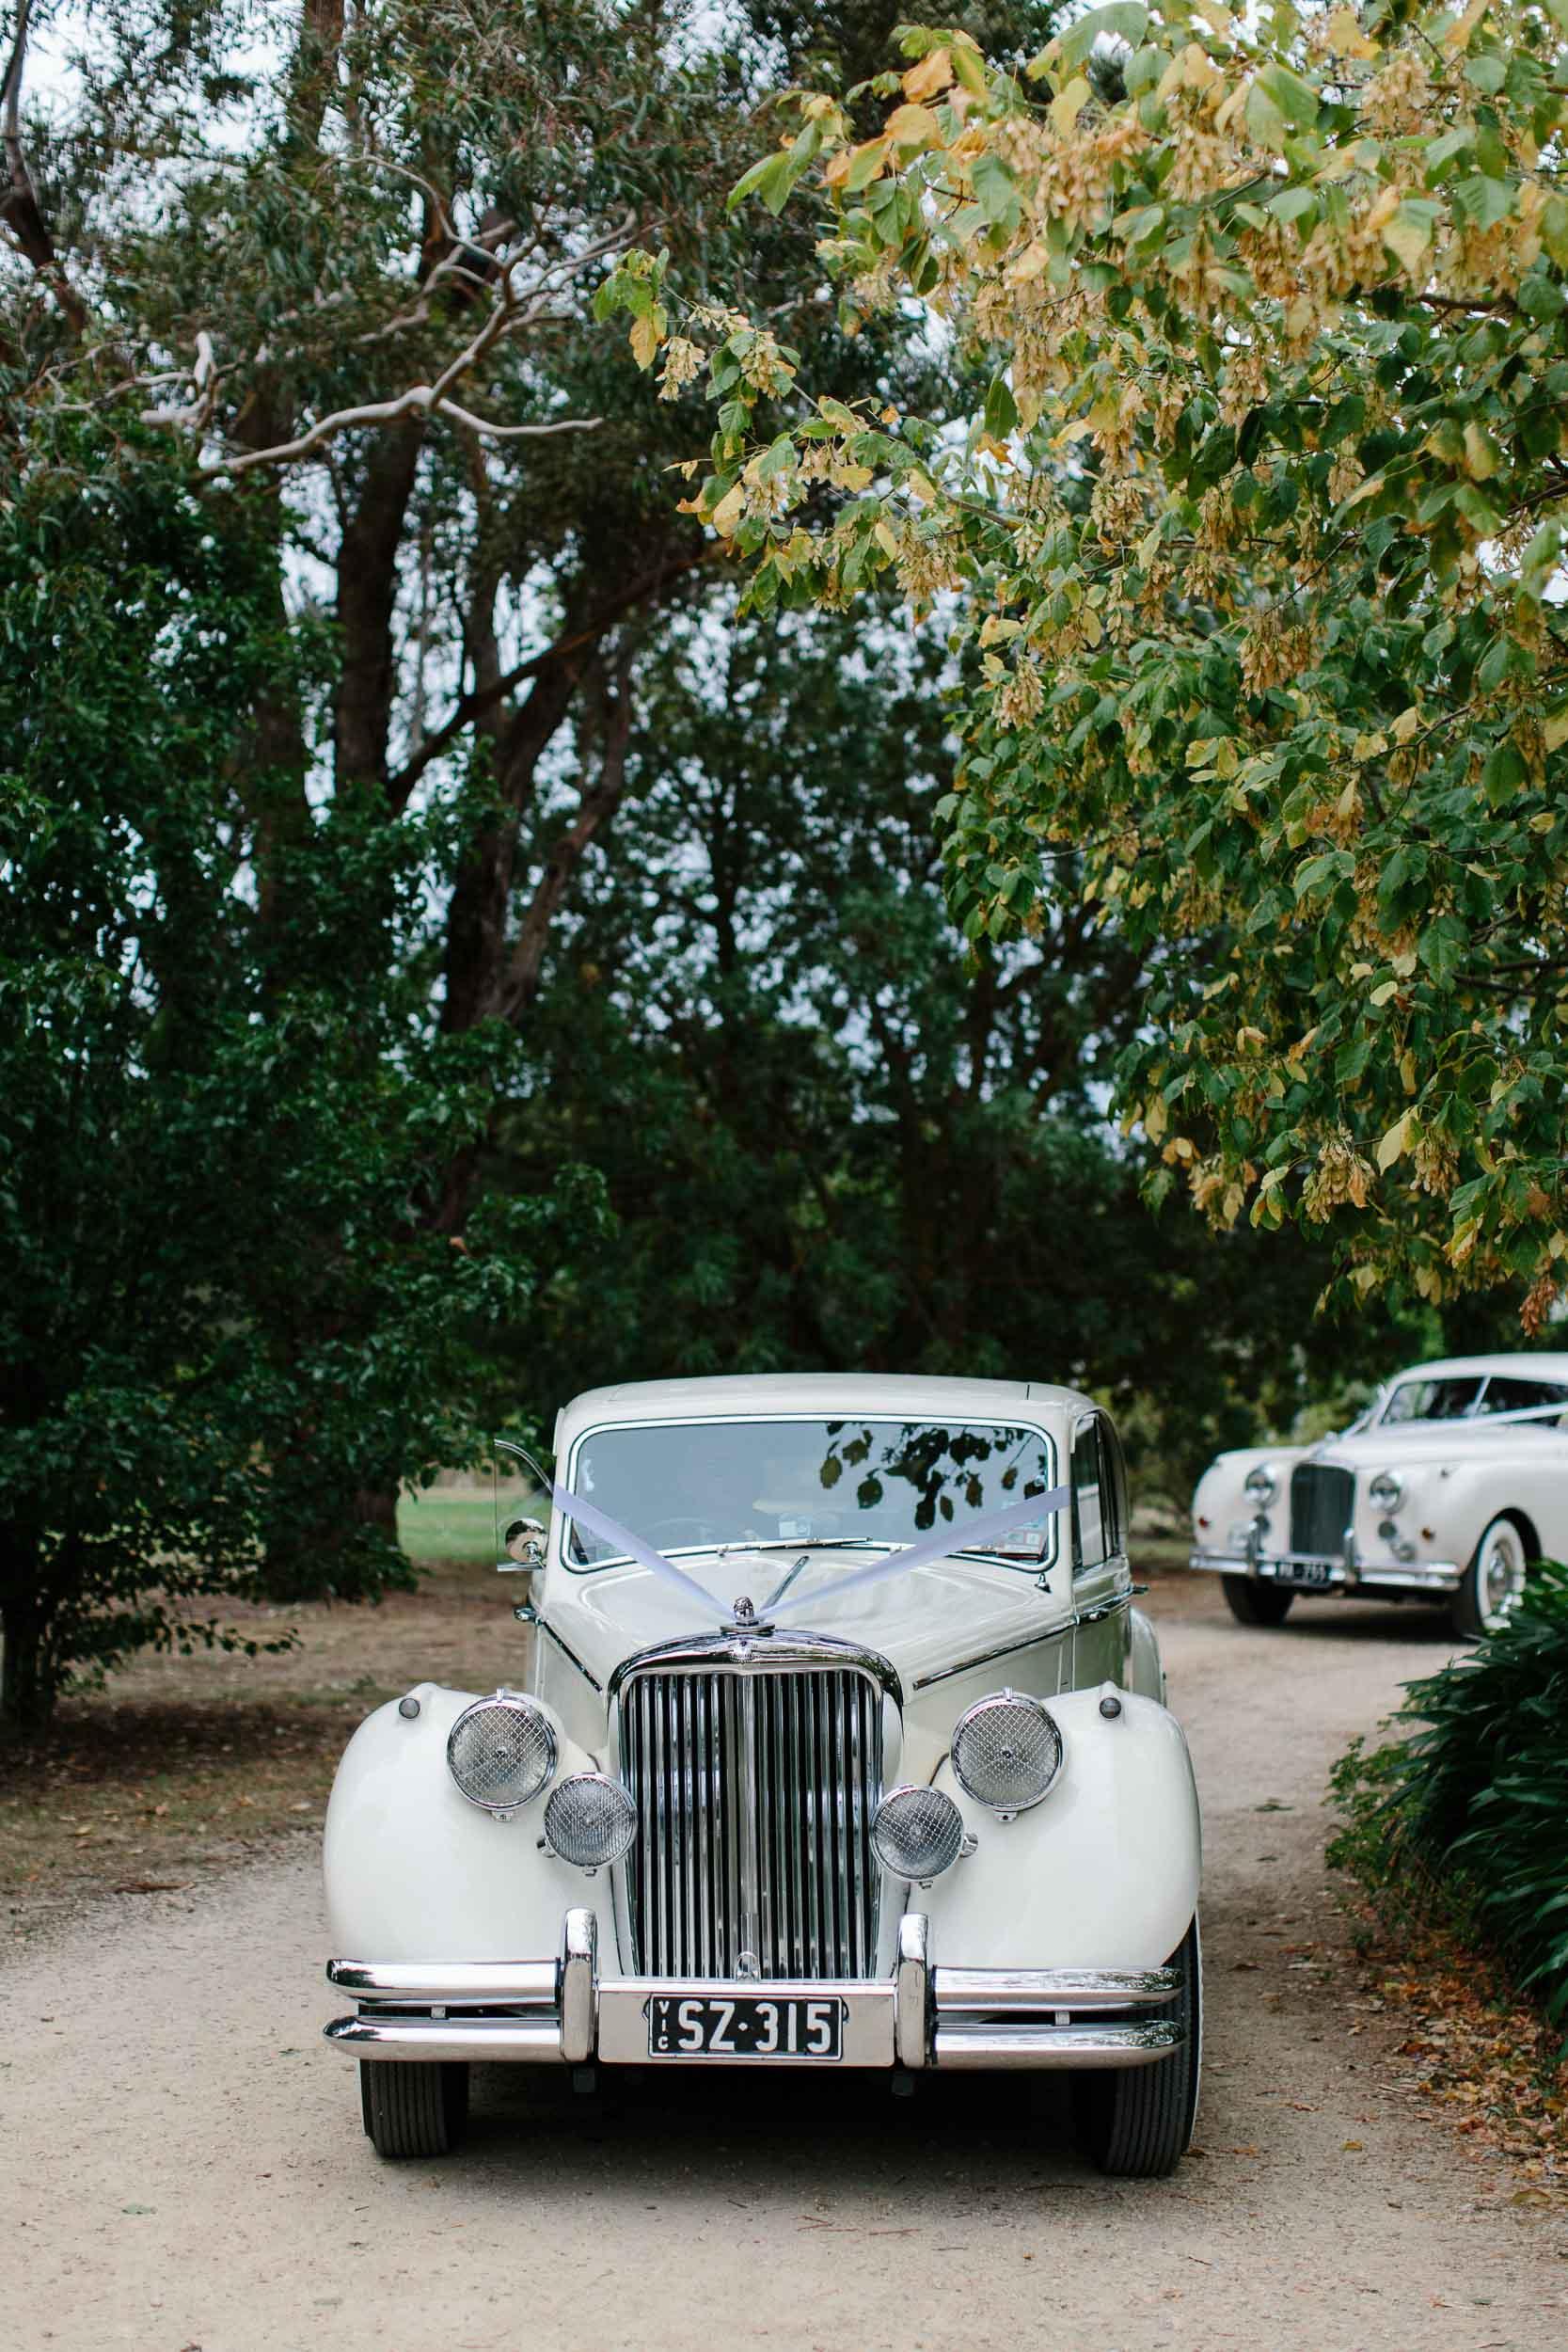 Kas-Richards-Mornington-Peninsula-Private-Property-Wedding-Marianna-Hardwick-Gown-181.jpg